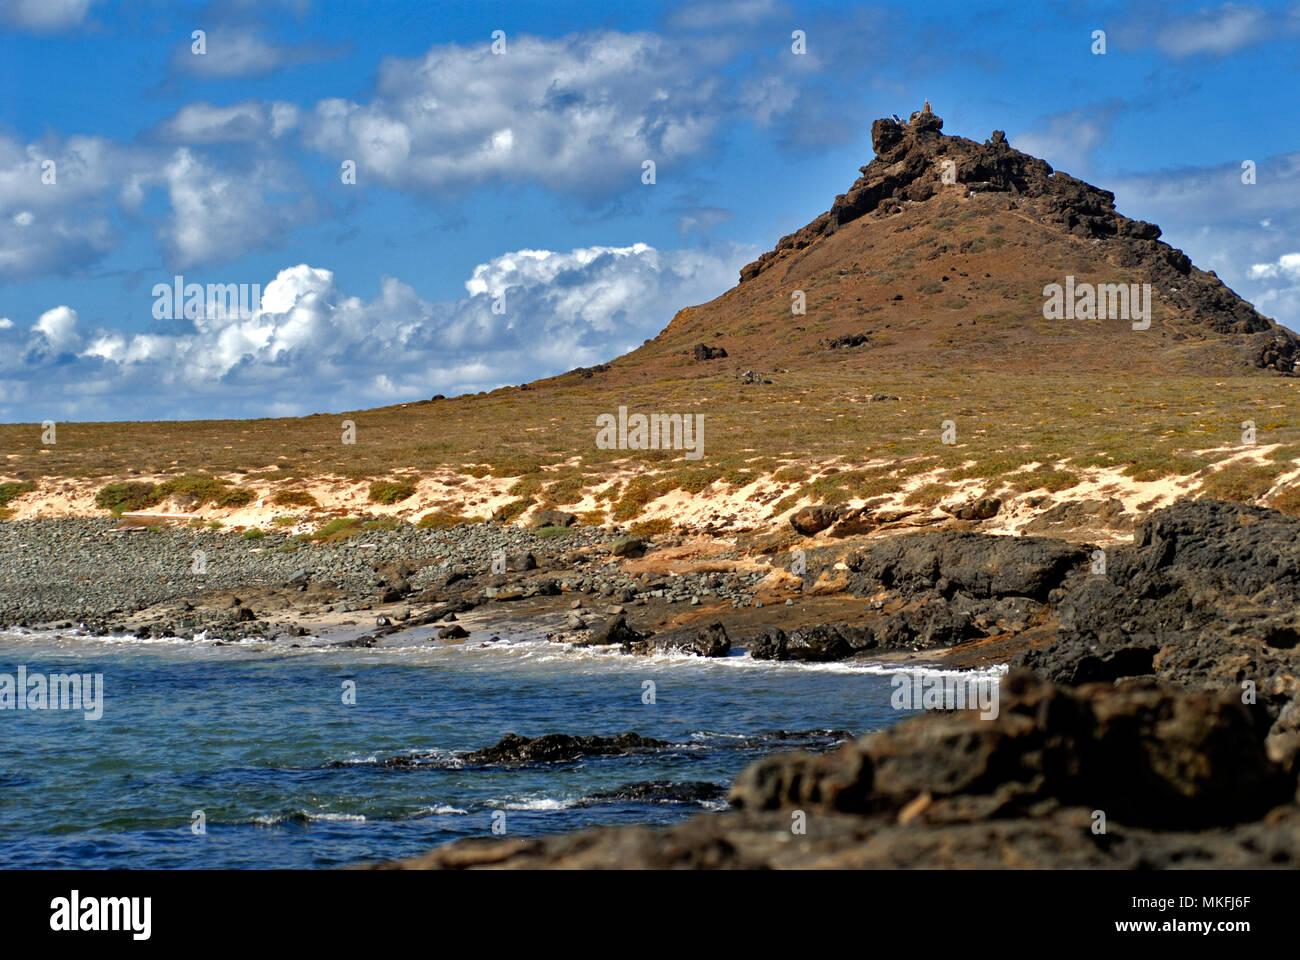 Selvagem Grande Pequeña (Pitón). Naturschutzgebiet, Savage Islands oder Selvagens Islands (Portugiesisch: Ilhas Selvagens). Madeira, Portugal Inseln. Makaronesien. Stockbild